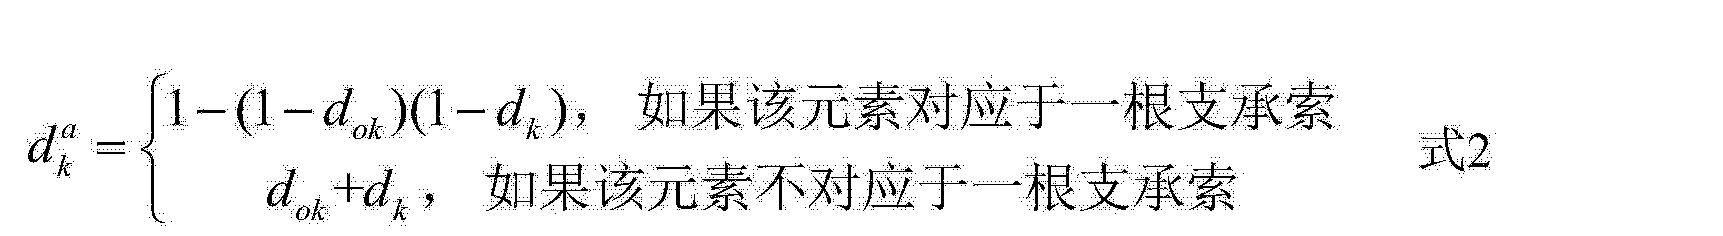 Figure CN103852304AD00232